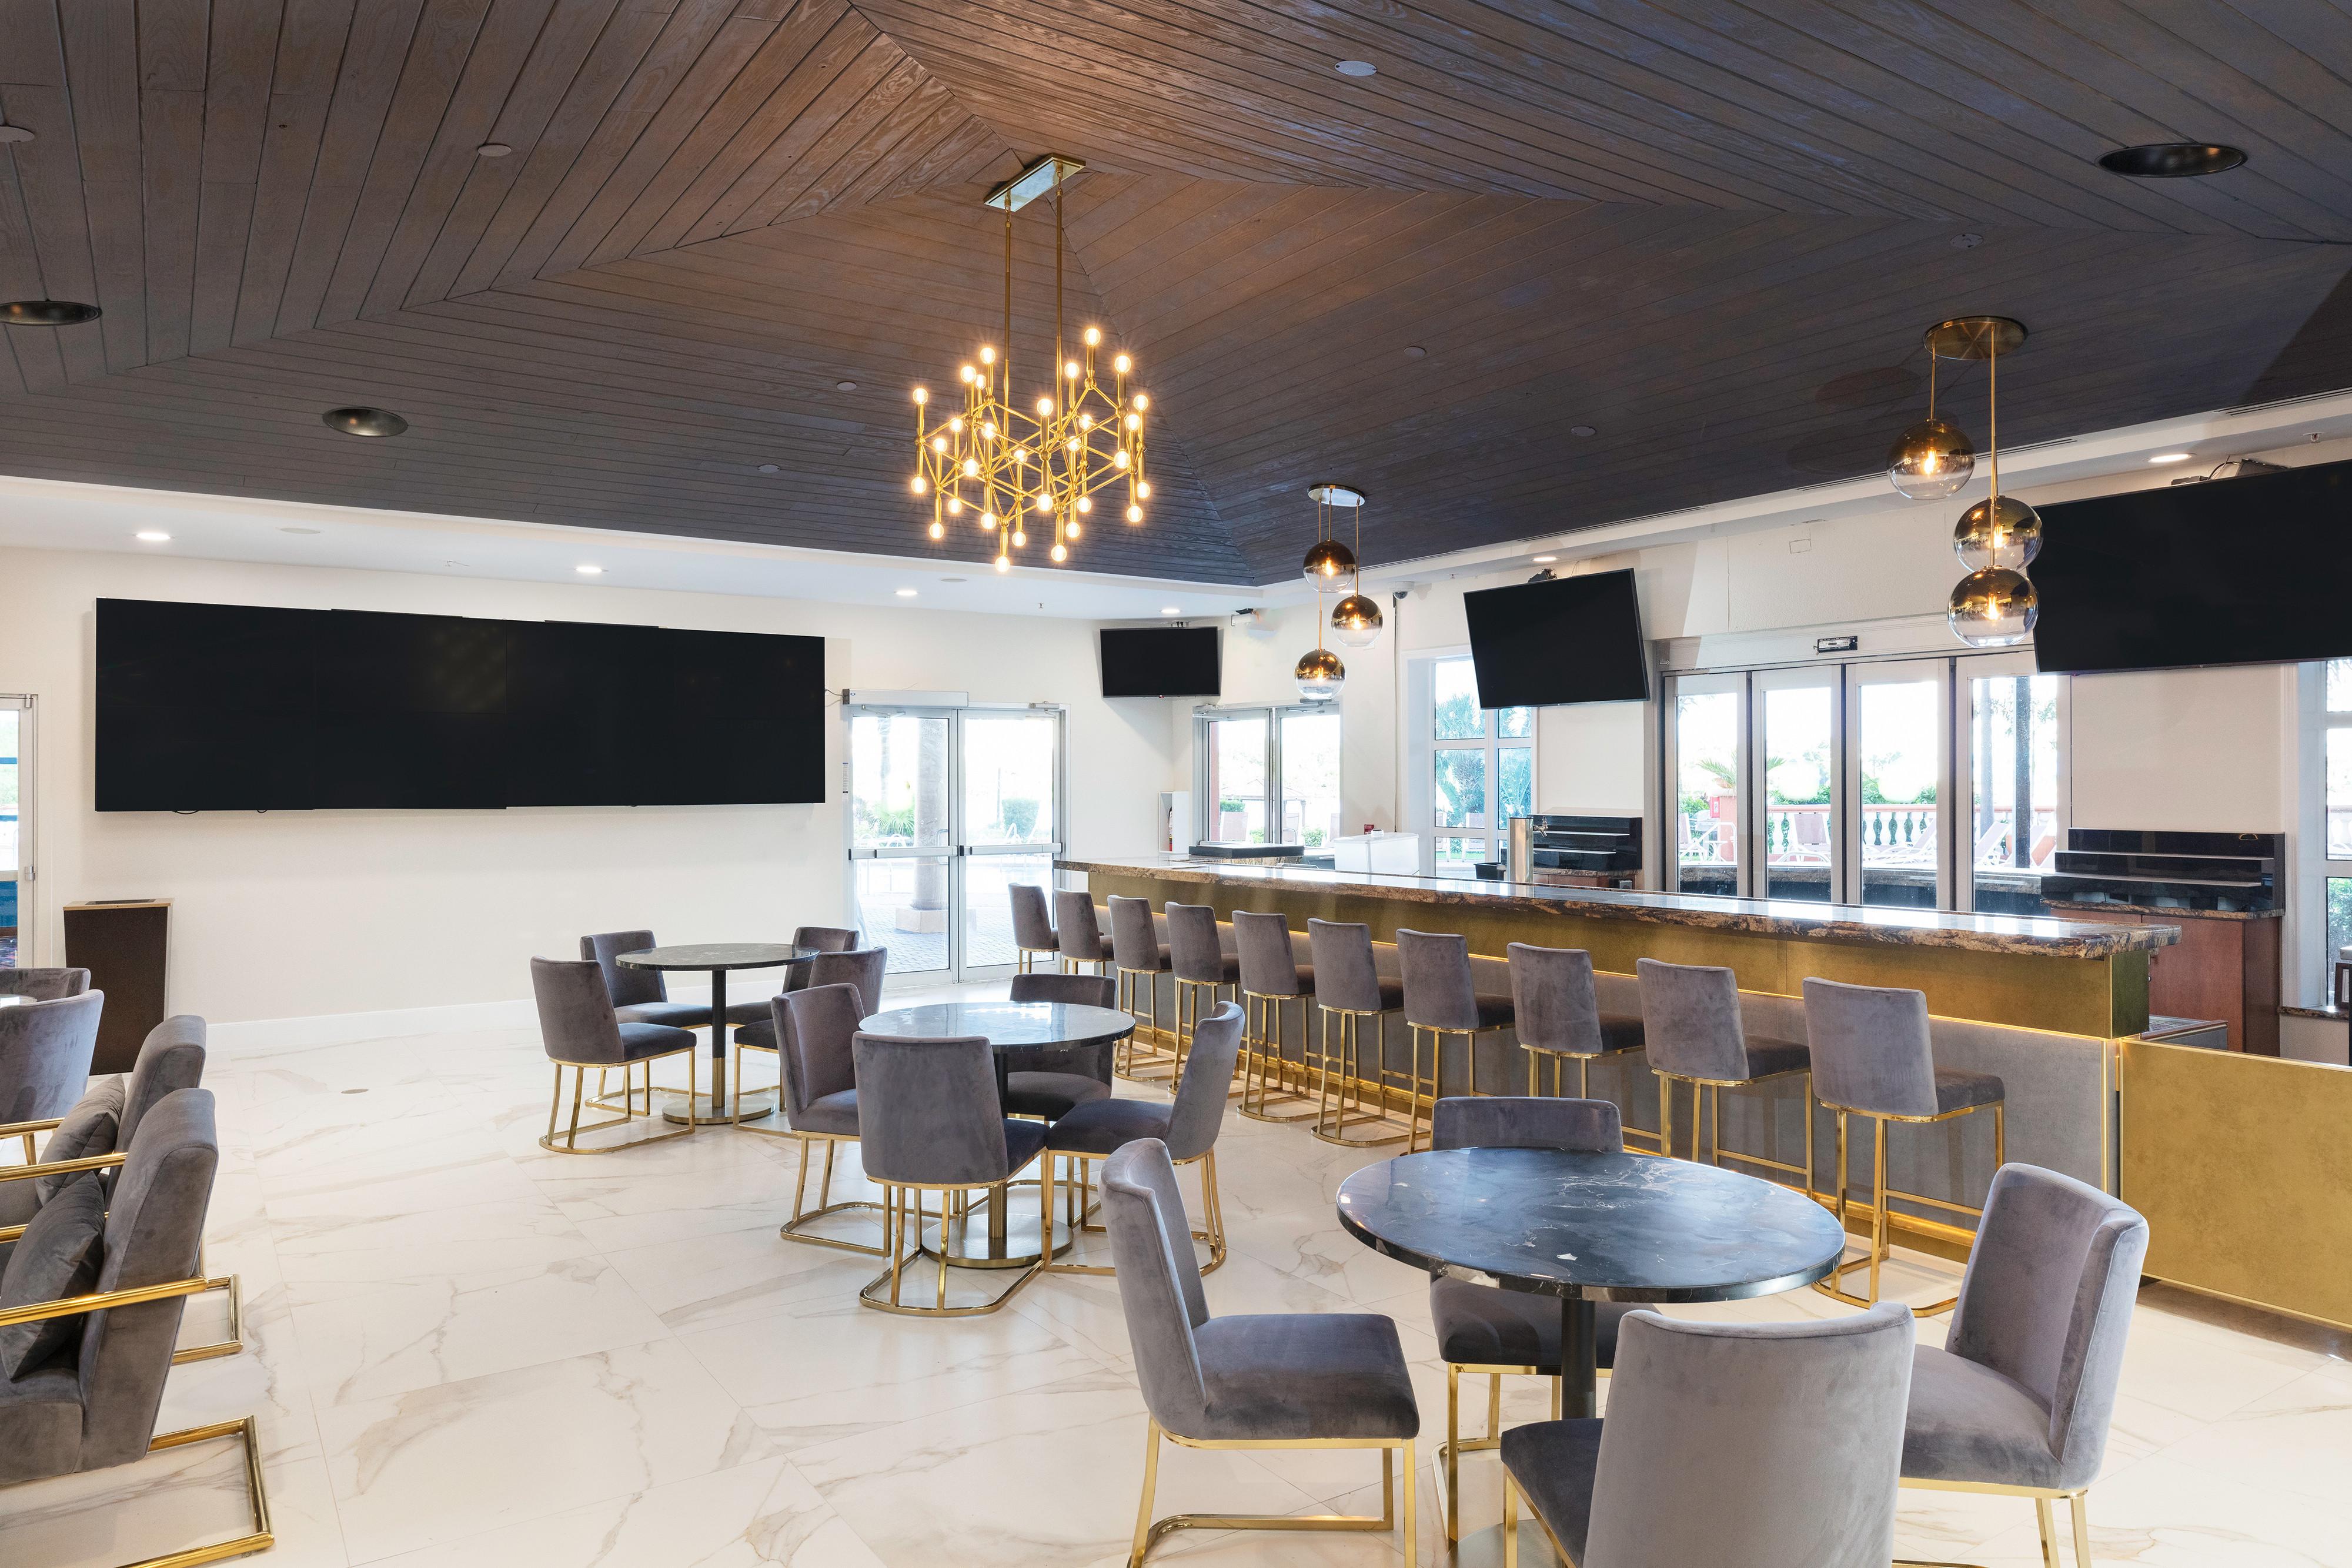 Hotel Dining in Orlando, FL 32819 | Best Restaurant Near International Drive | Food at Westgate Palace Resort